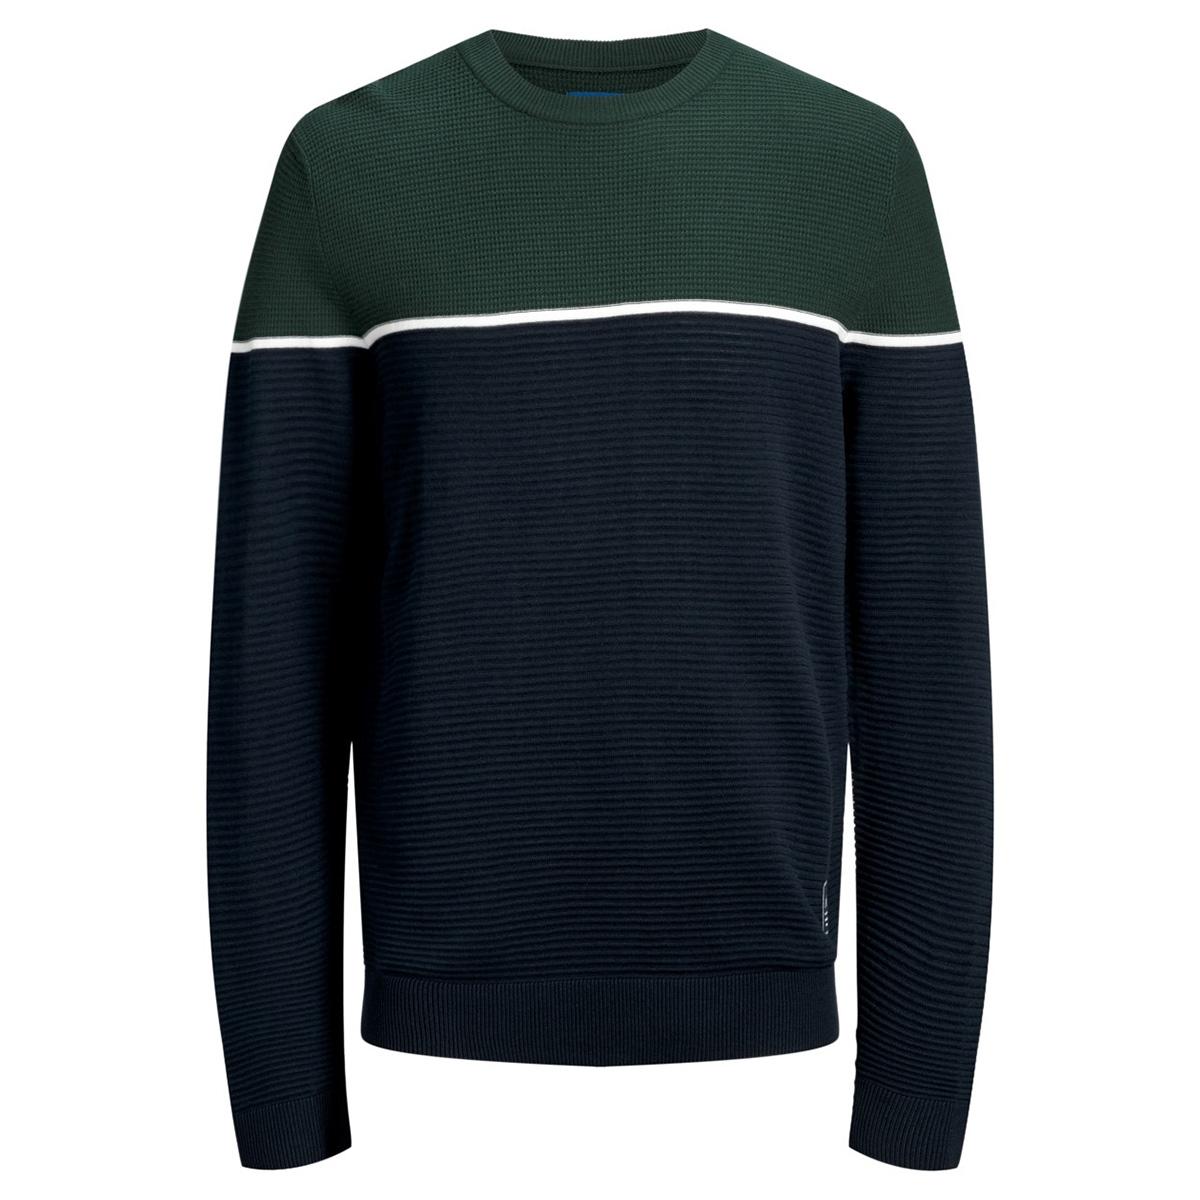 jorbrit knit crew neck 12159079 jack & jones trui sea moss/knit fit